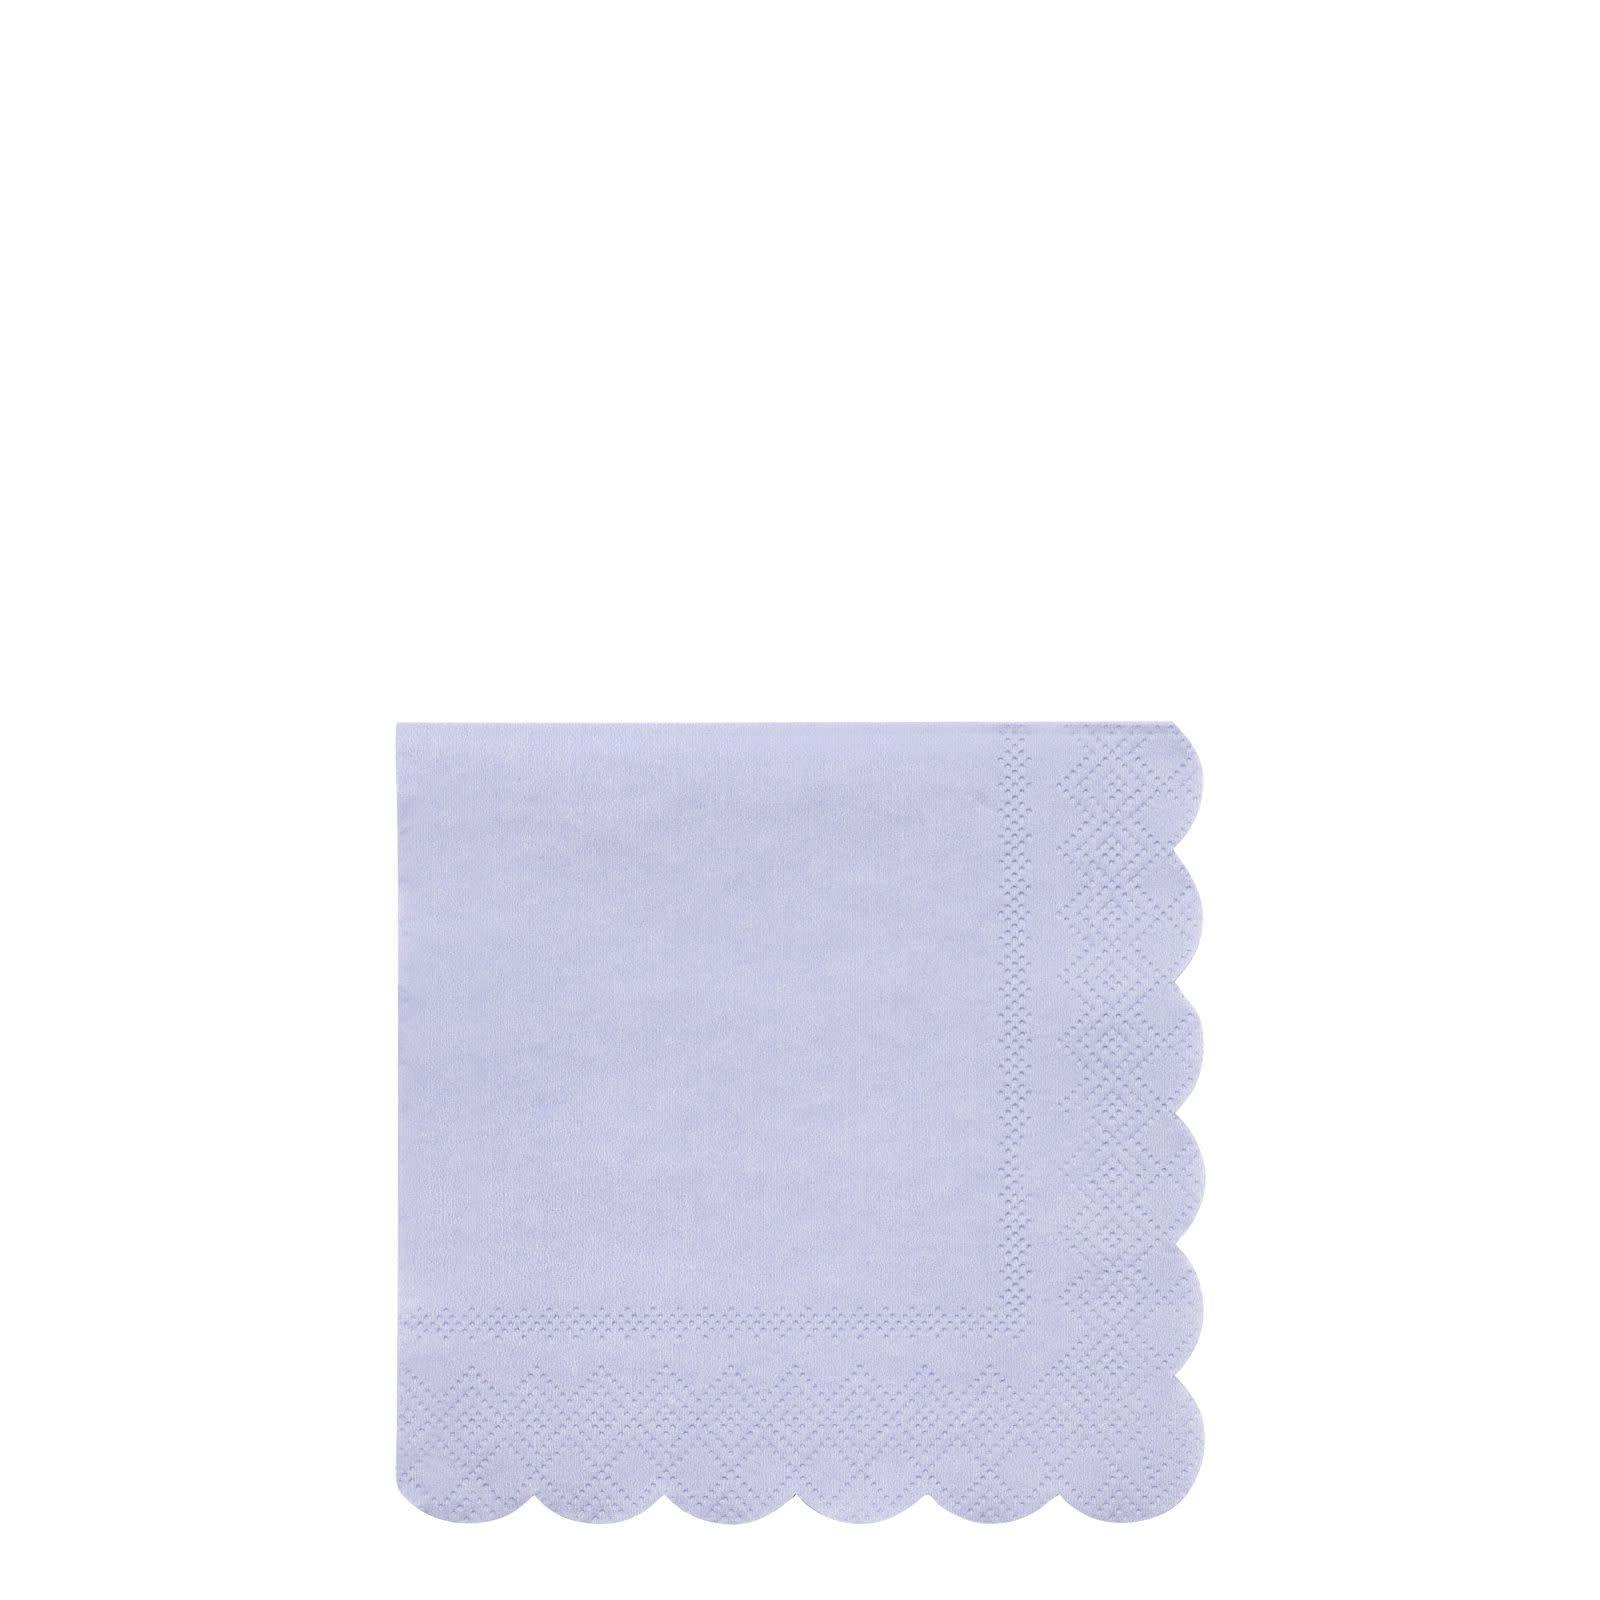 MERIMERI Blue simply eco napkins S